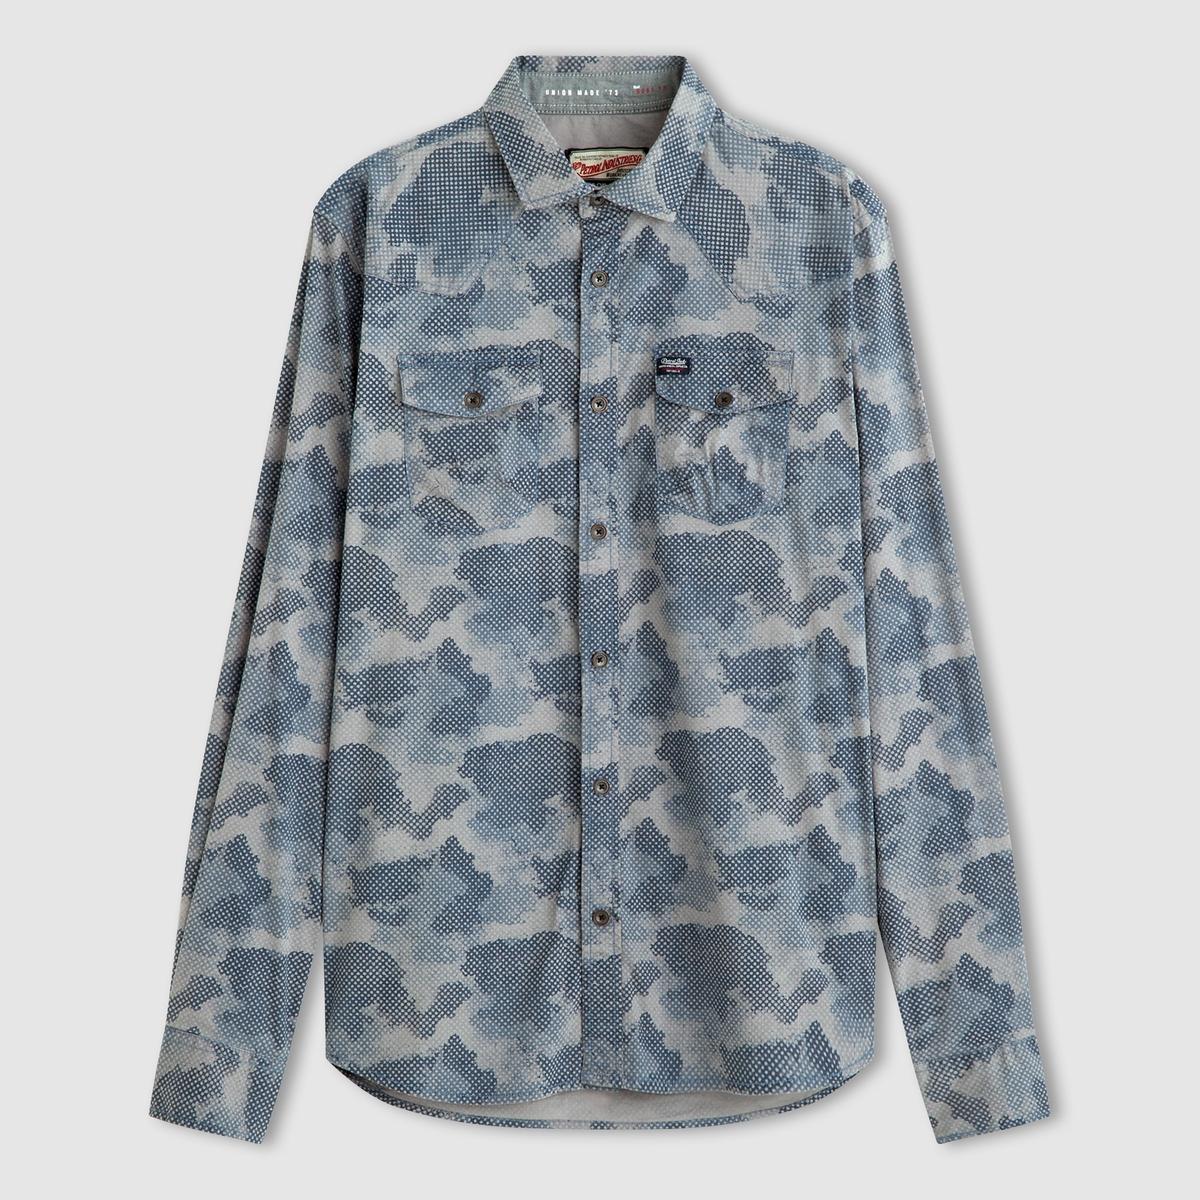 Рубашка с рисункомСостав и описаниеМатериал: 98% хлопка, 2% эластана.Марка: PETROL INDUSTRIES.<br><br>Цвет: серый<br>Размер: L